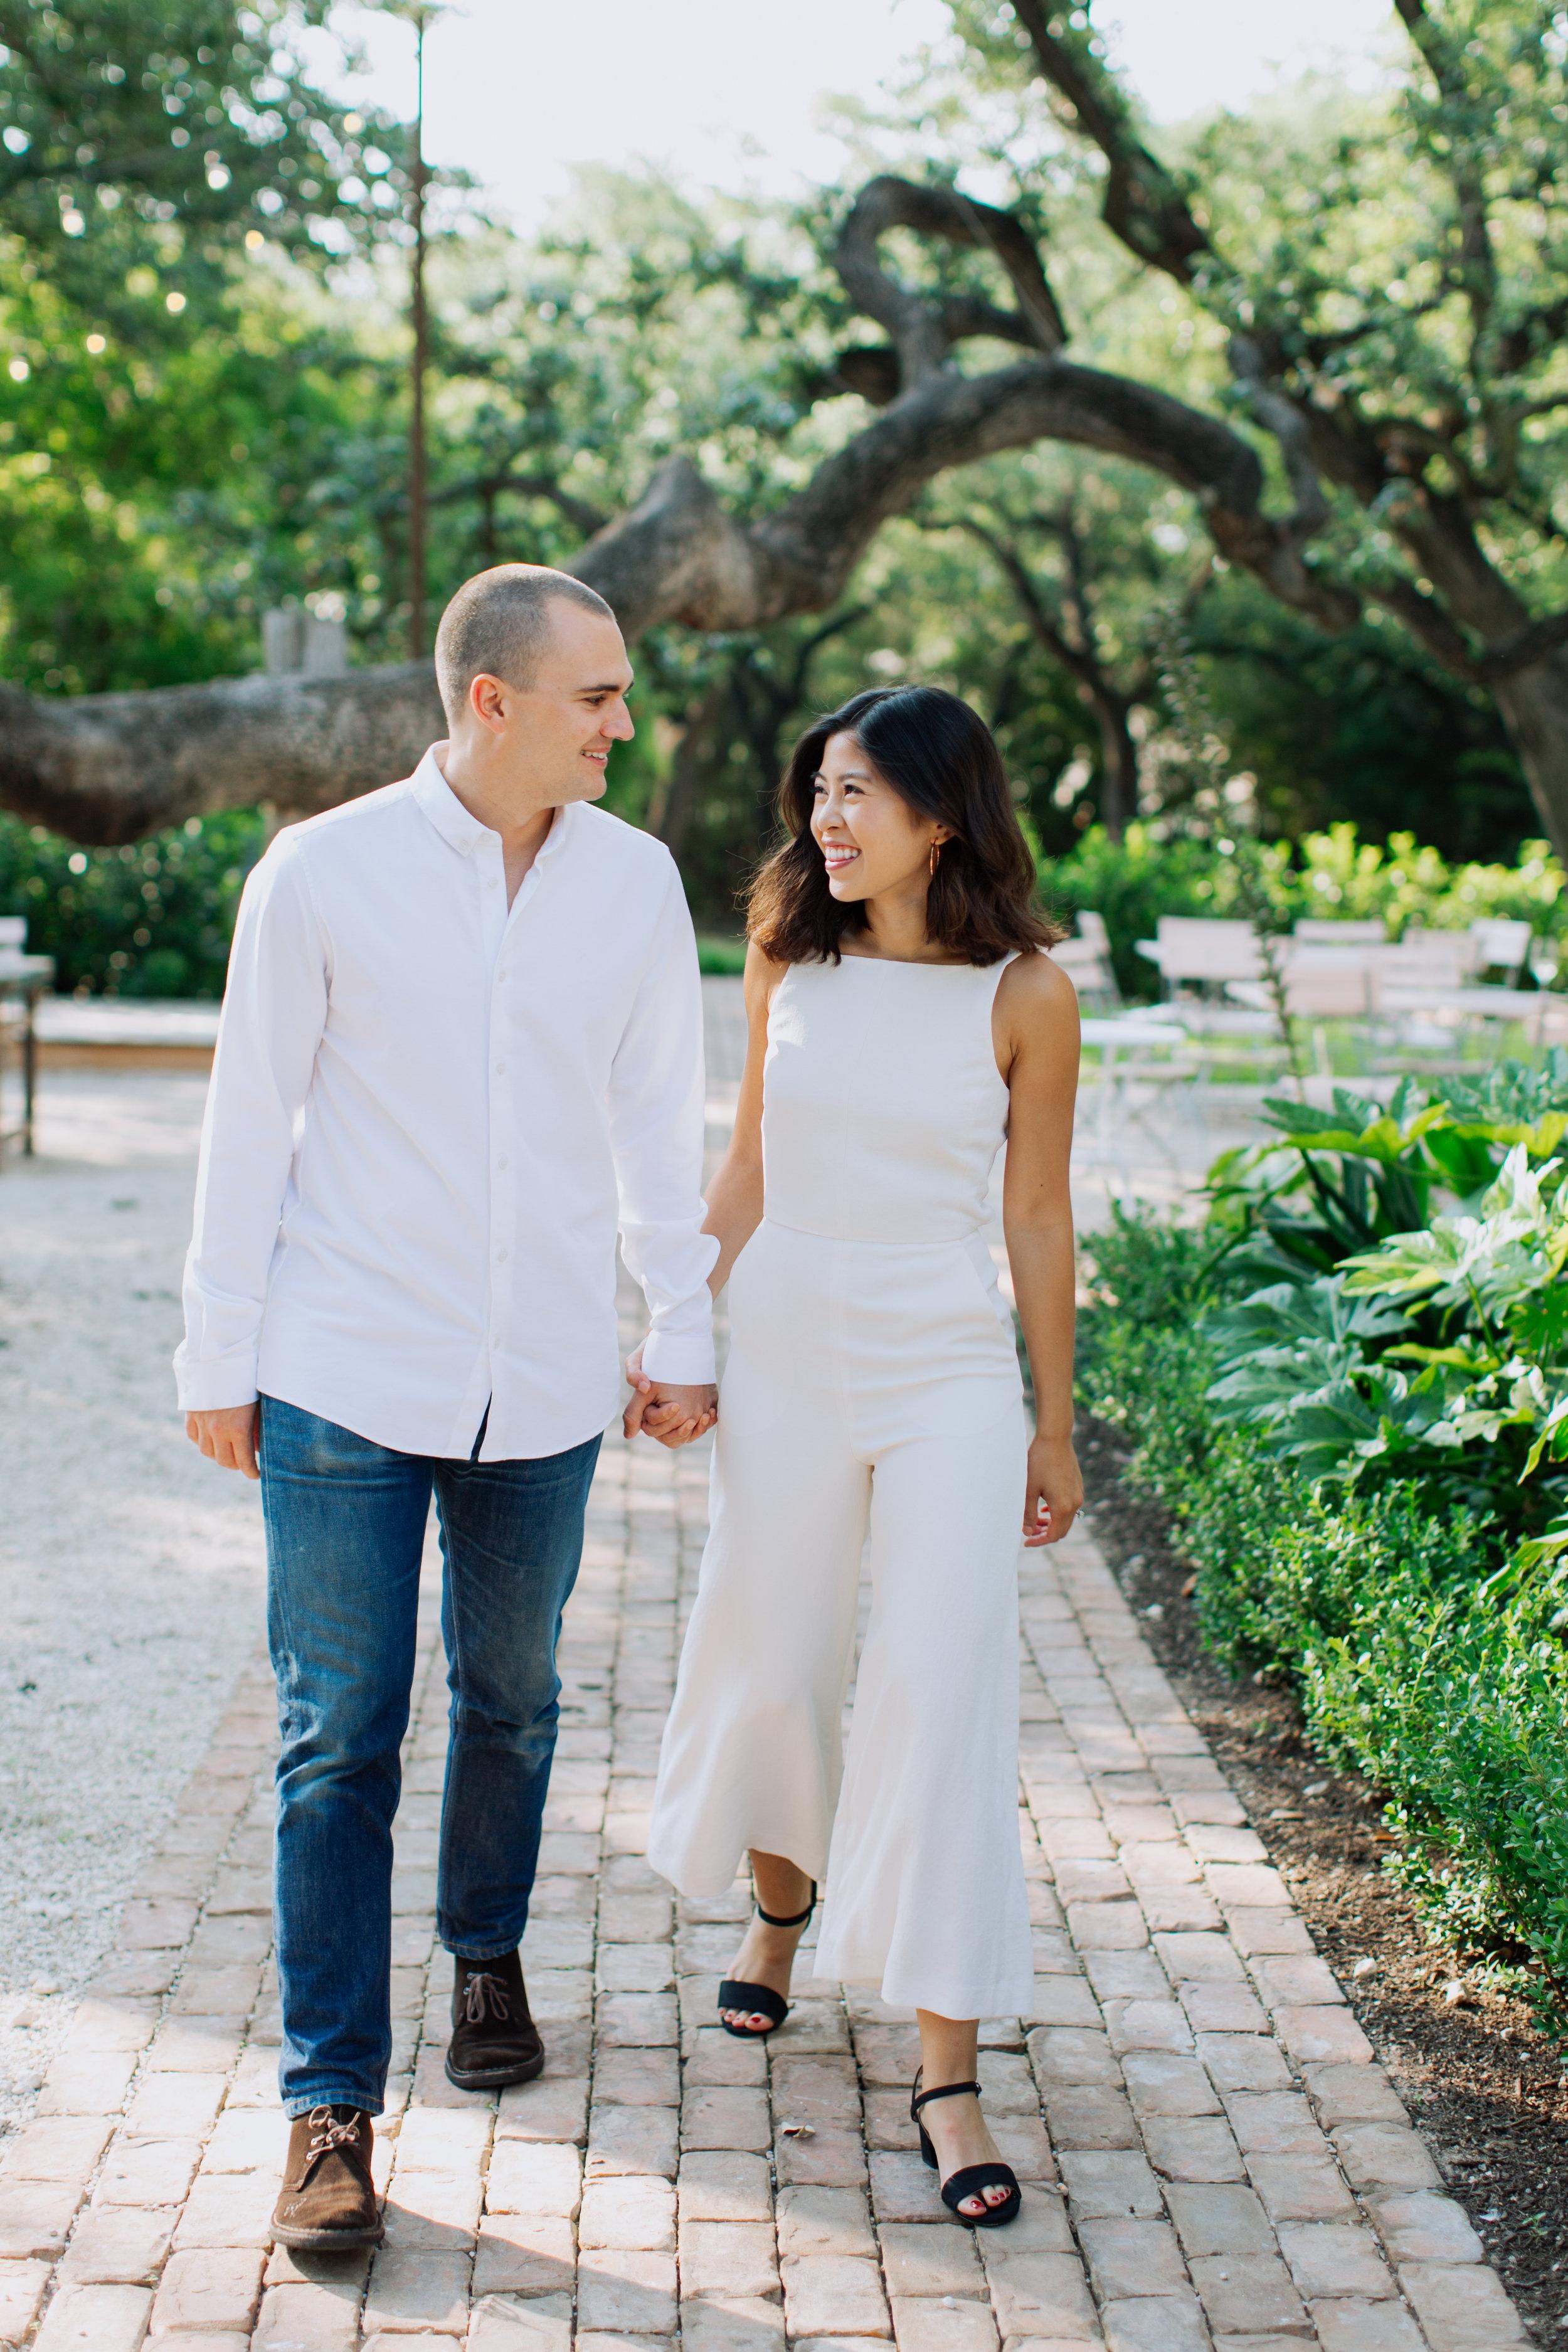 Paige-Newton-Photography-Engagement-Session-Austin-Manana-Coffee-Matties0017.jpg